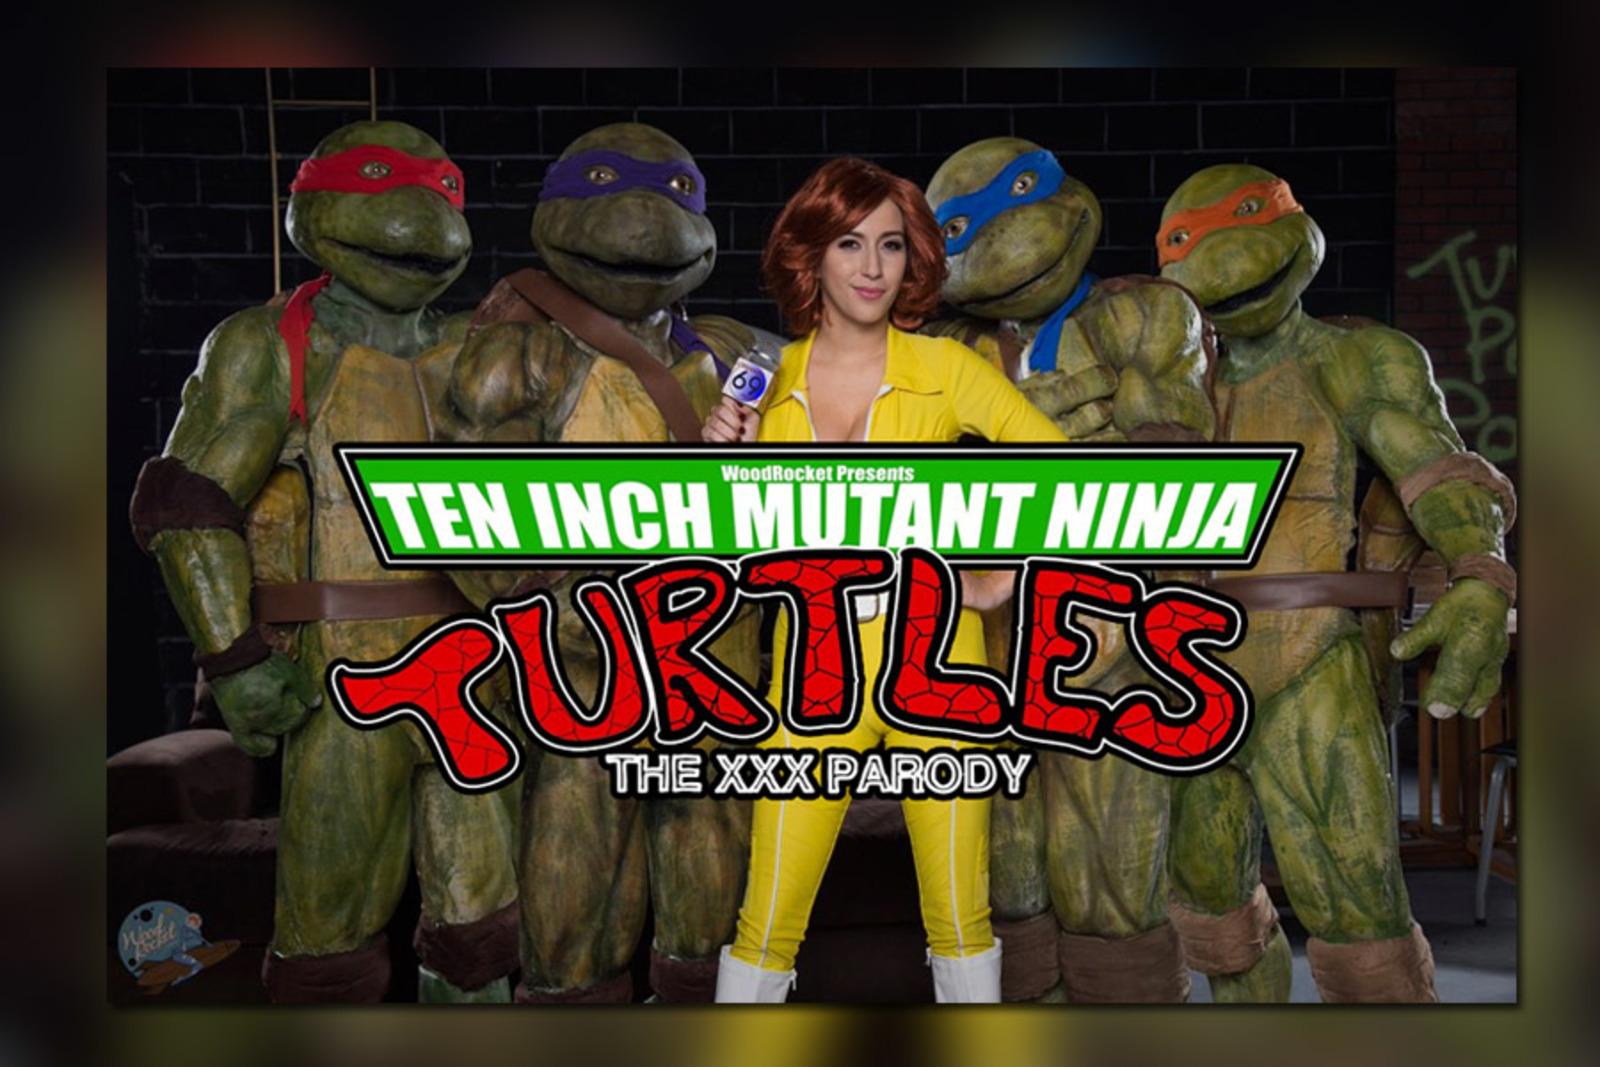 Ten inch mutant ninja turtles theme